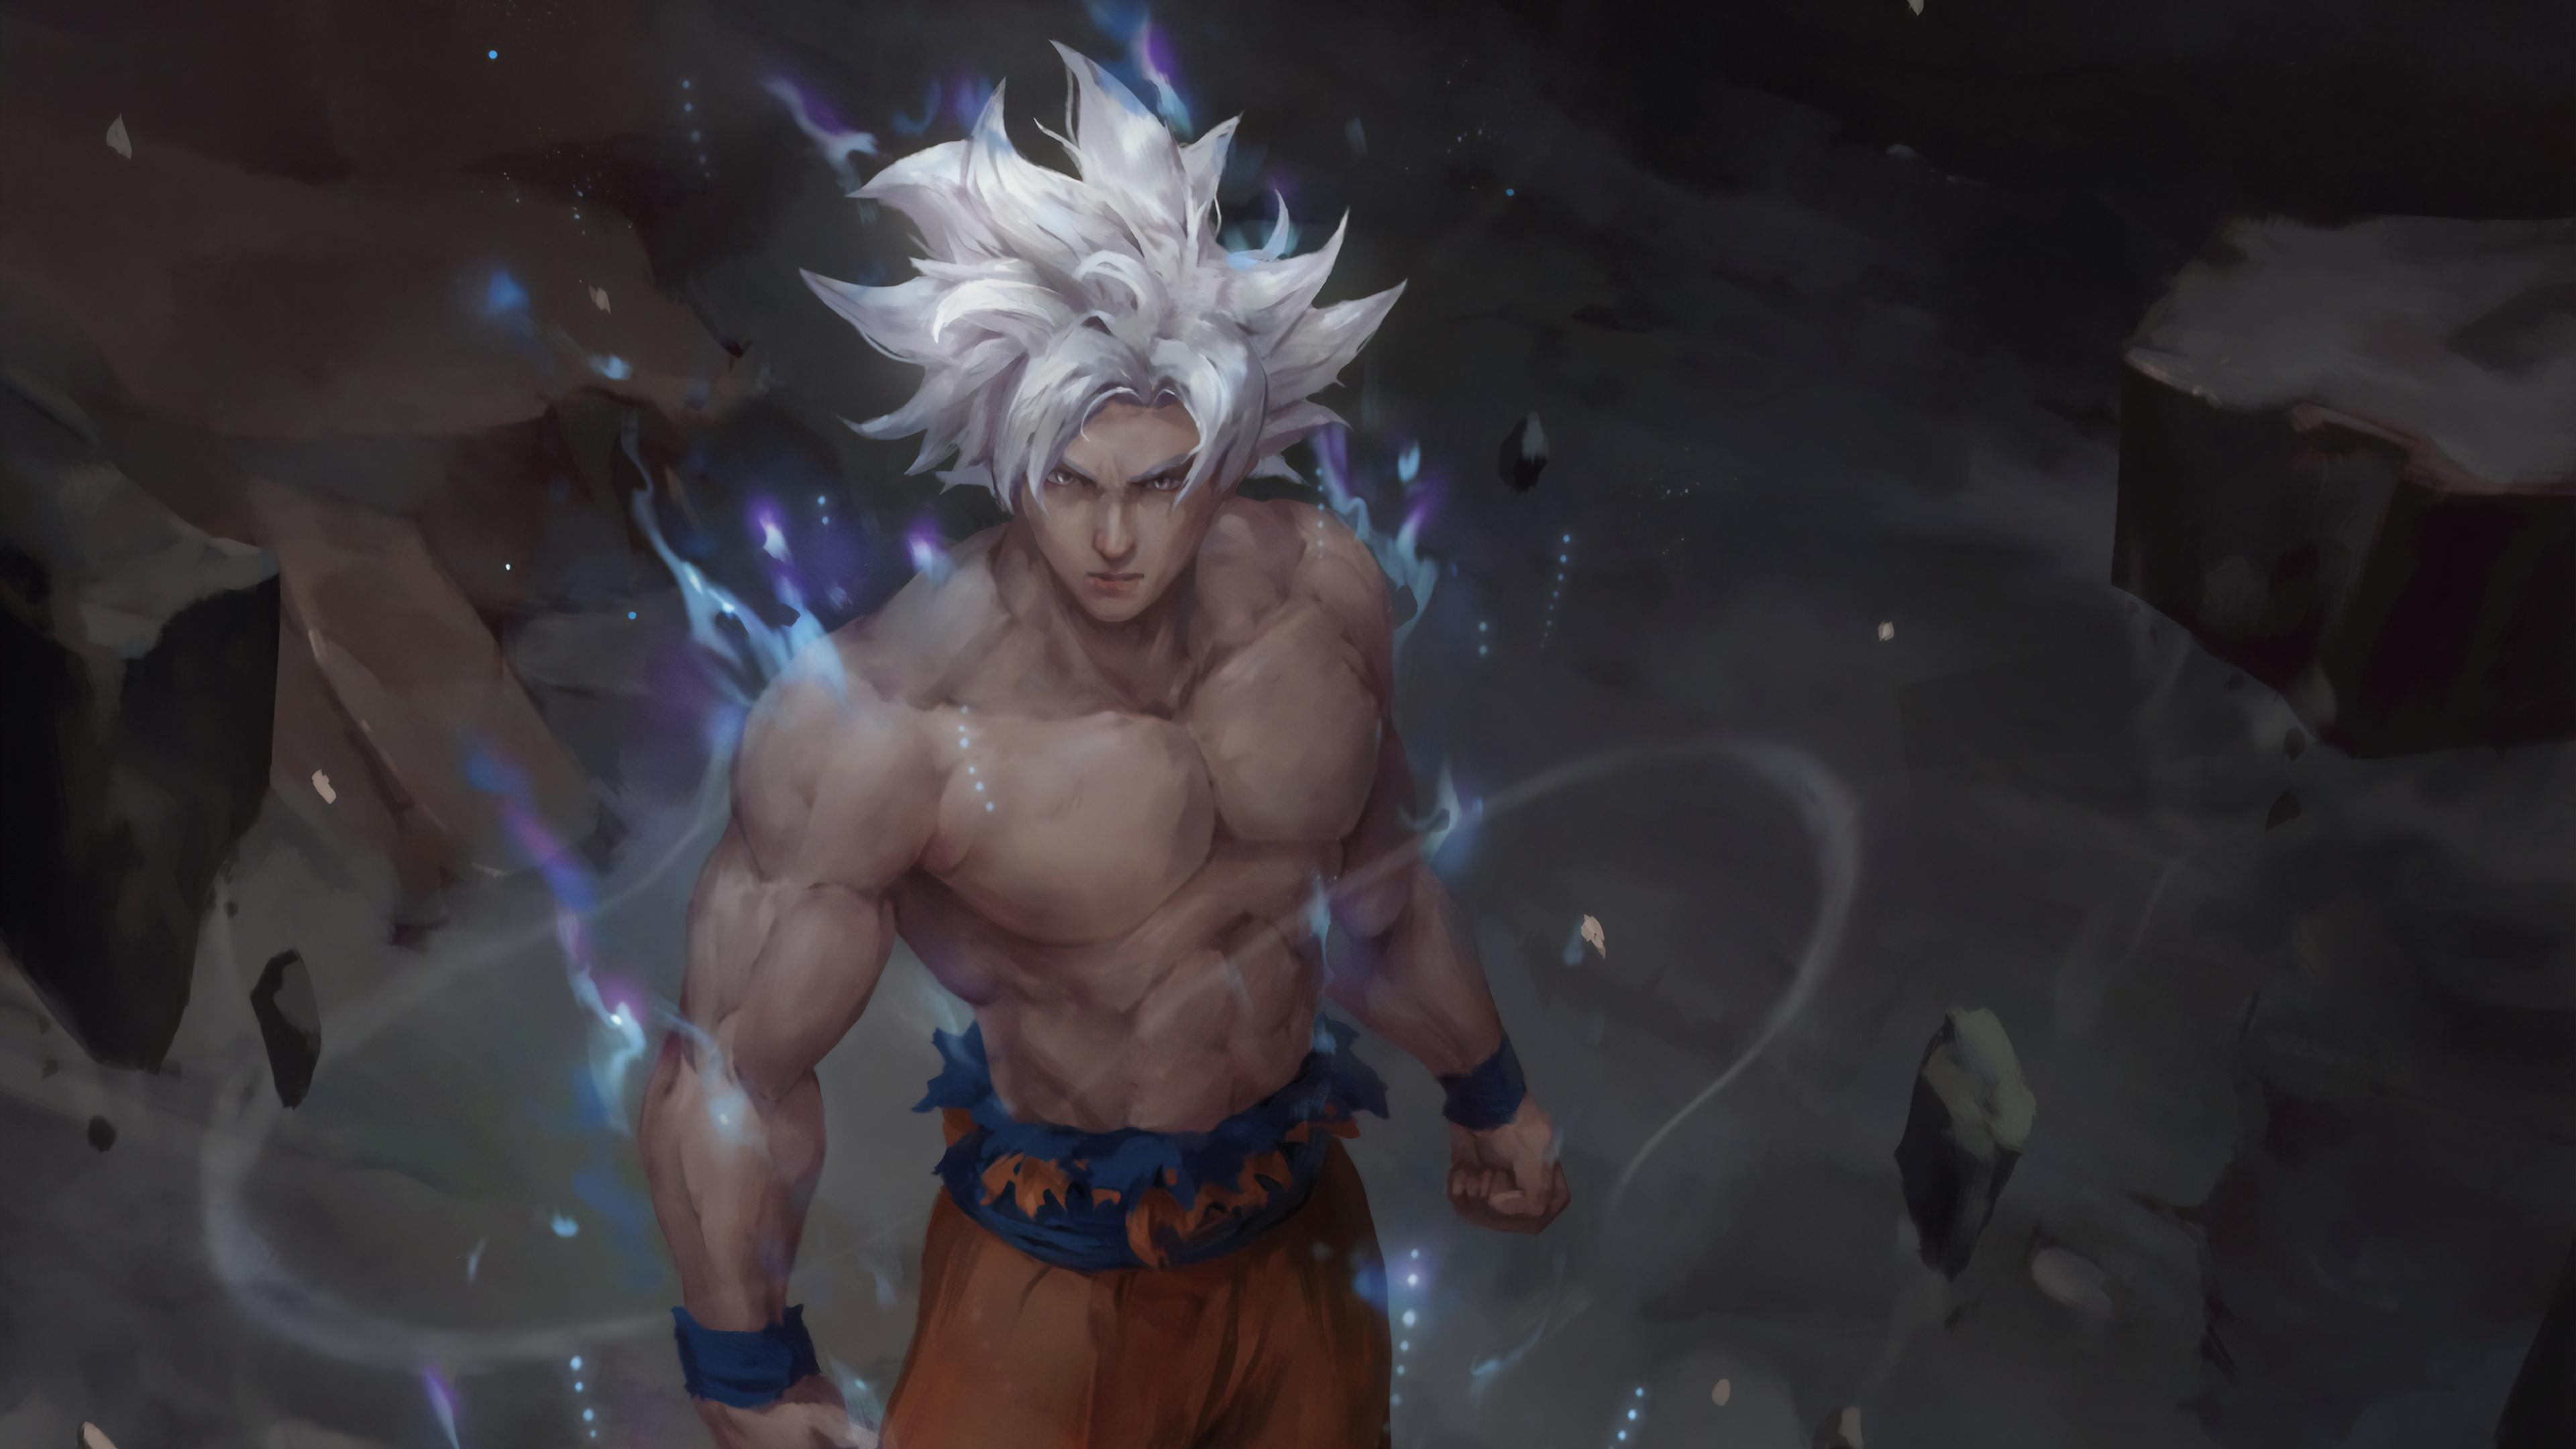 ultra instinct goku art 1578253643 - Ultra Instinct Goku Art -